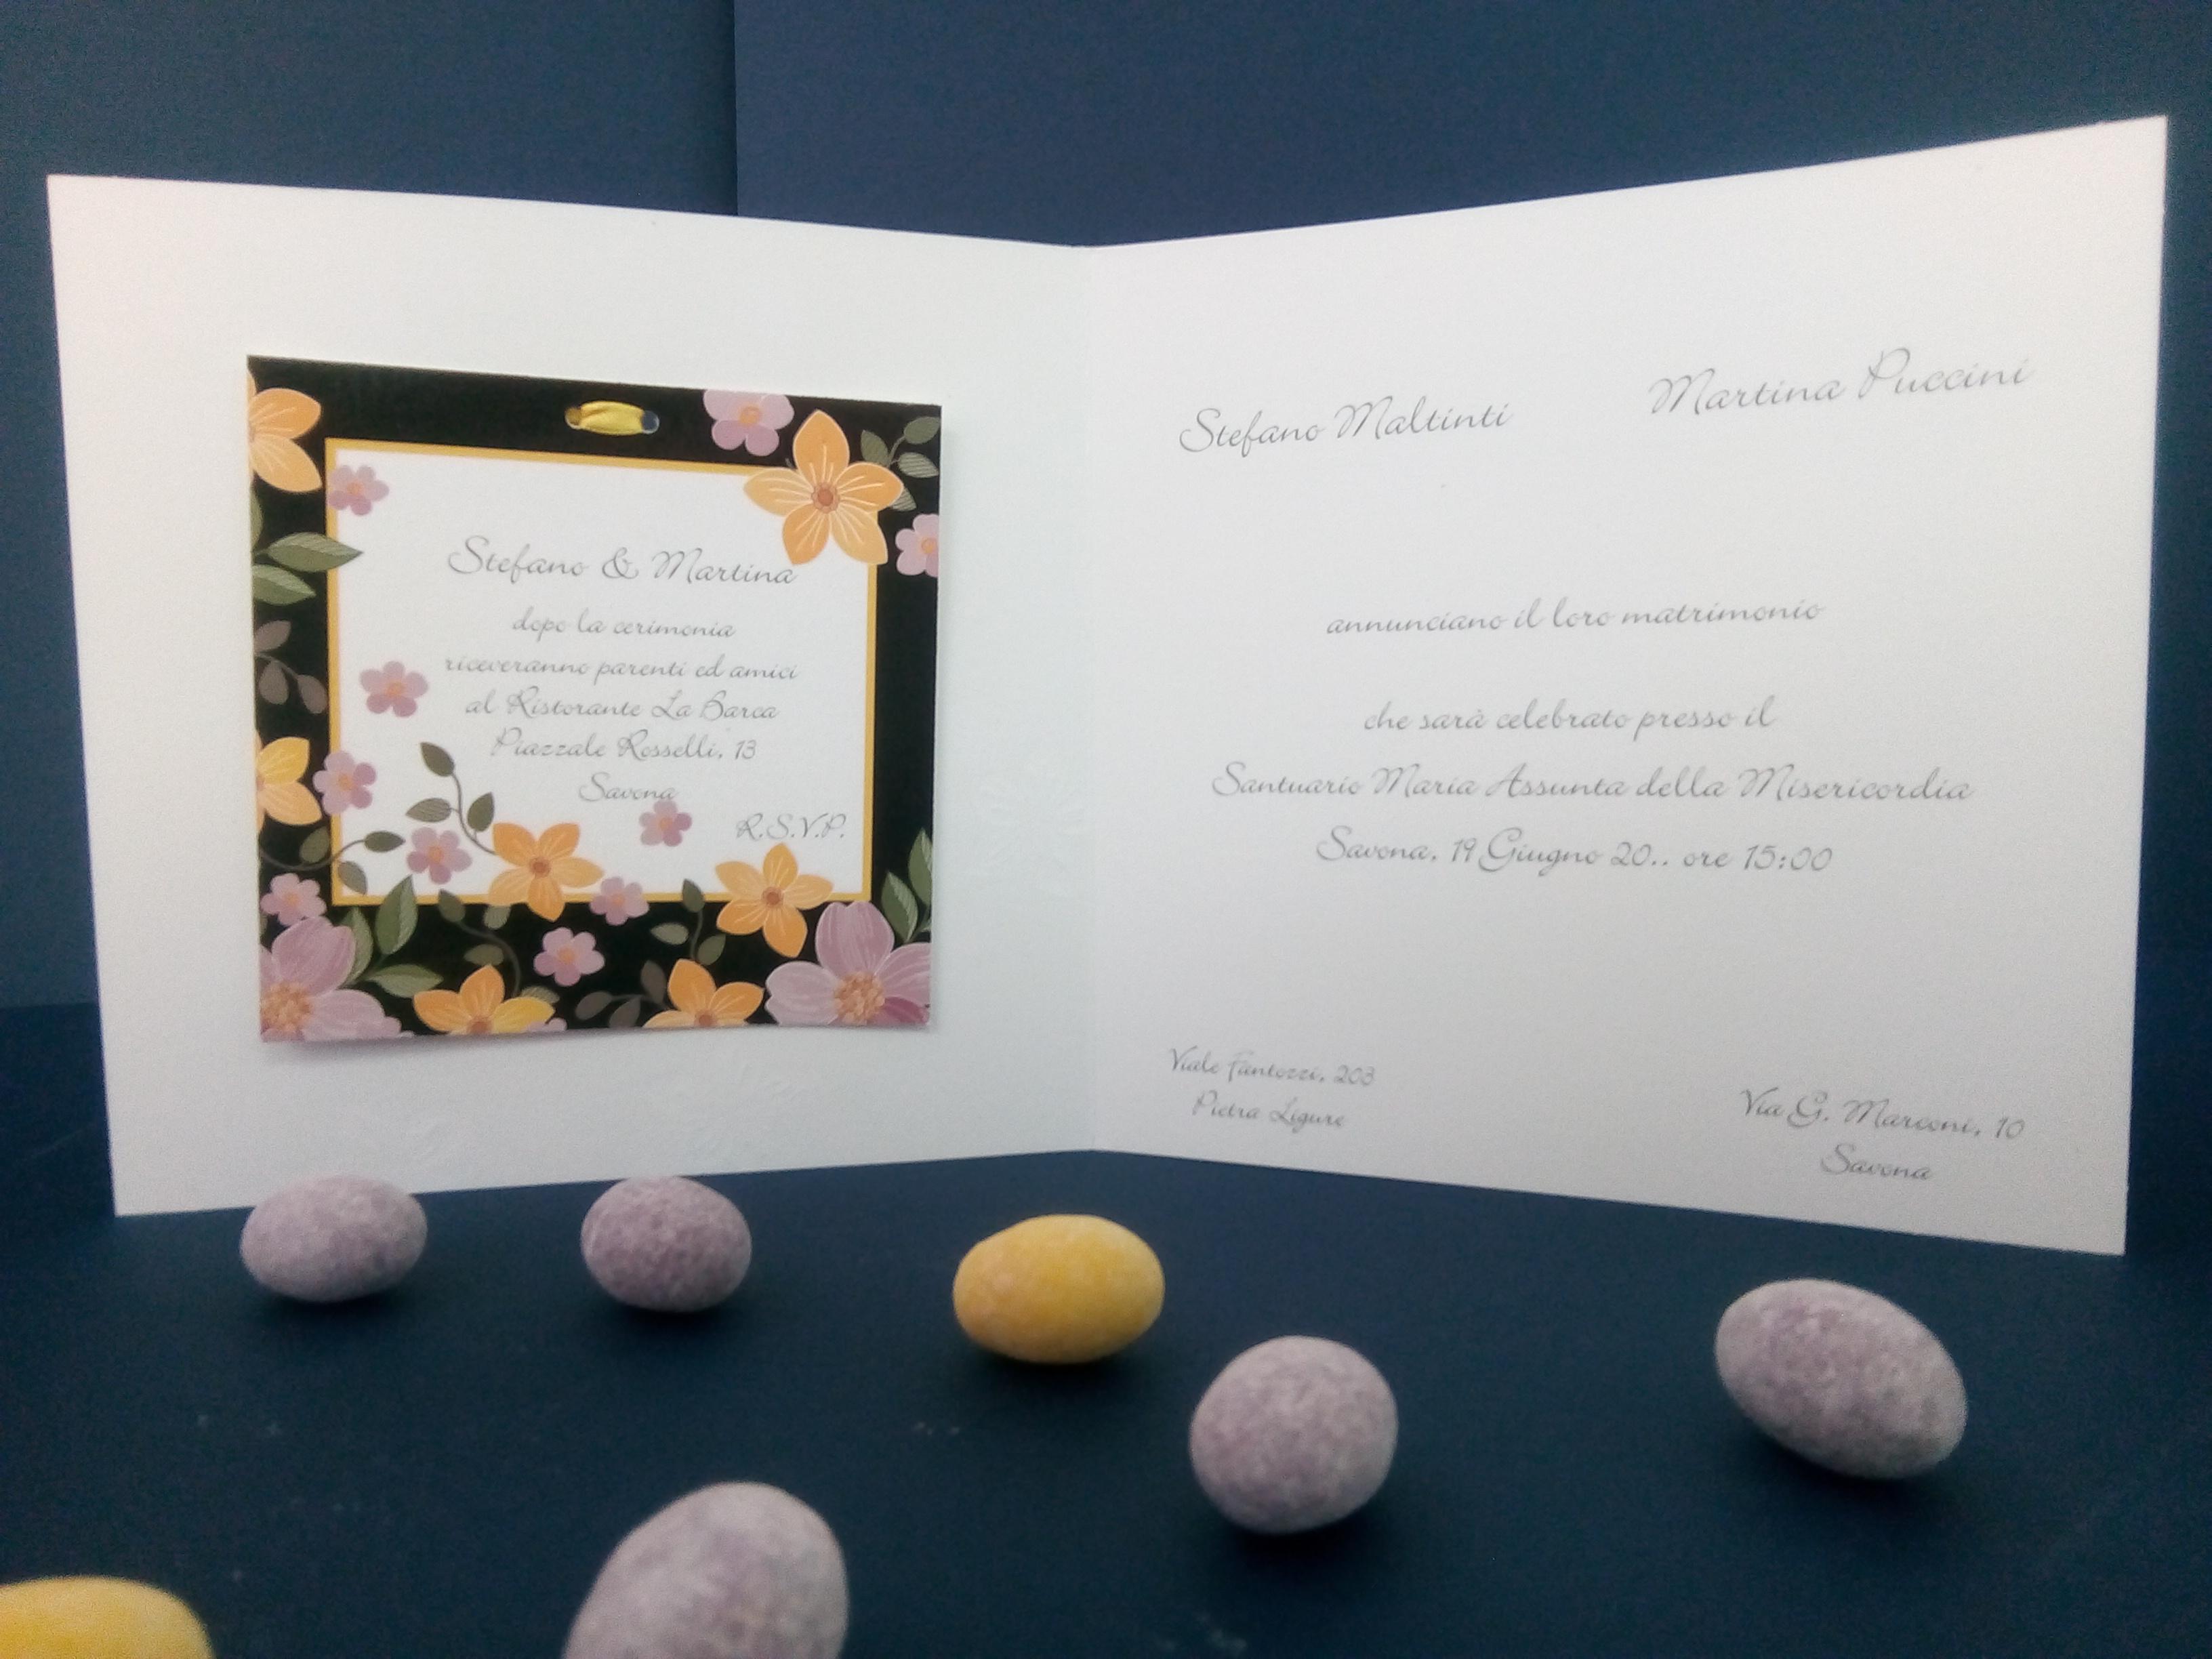 Partecipazioni Matrimonio 2018 Online.Partecipazione Di Matrimonio Ermione Partecipazione Novita